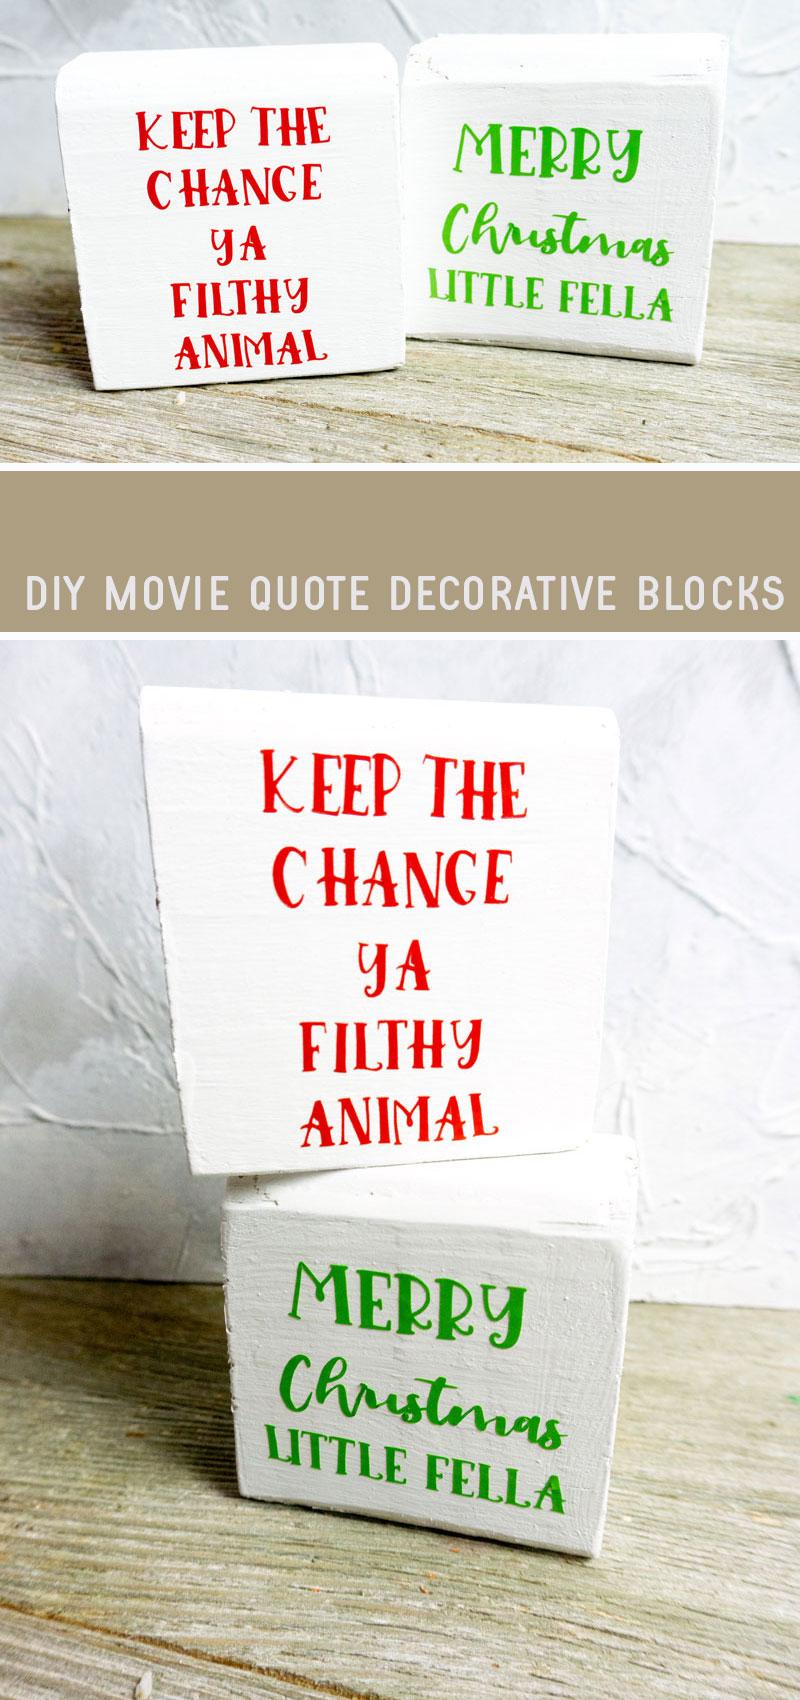 HOme Alone Decor blocks- DIY Cricut Christmas Decor